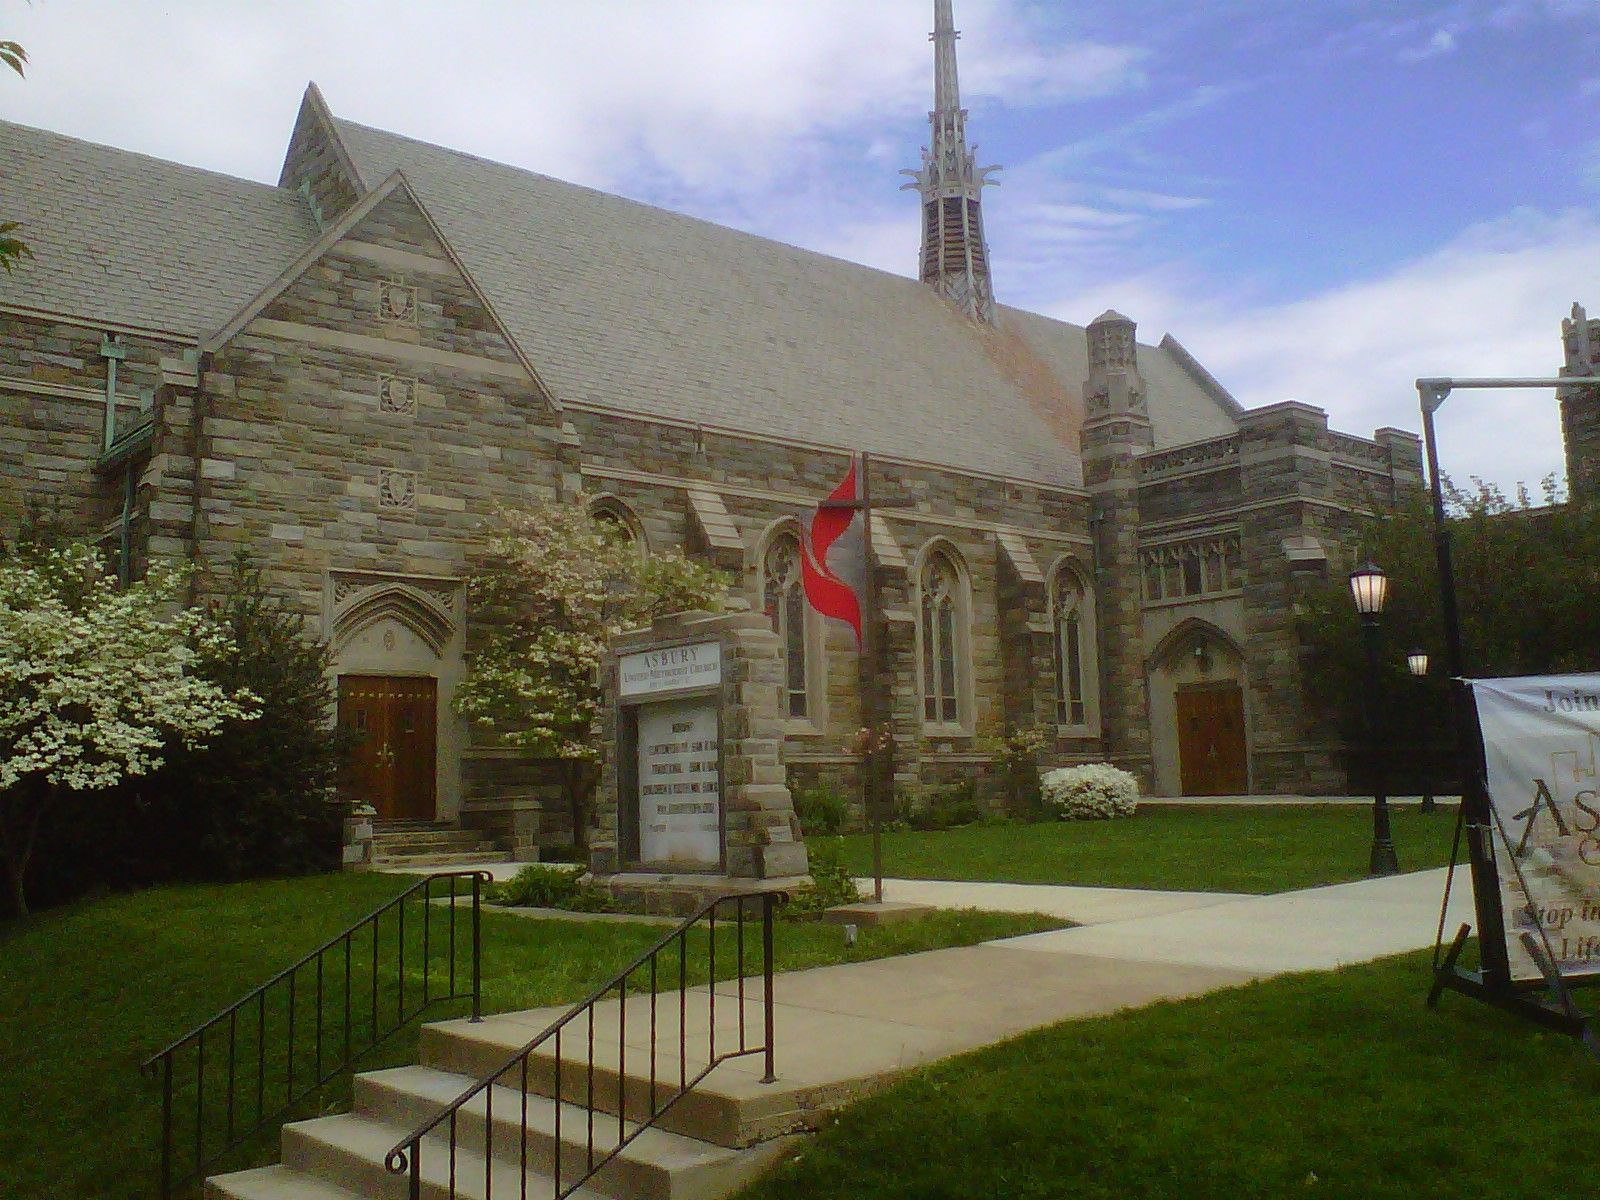 Asbury United Methodist Church, at 340 E. Market St. since 1925.